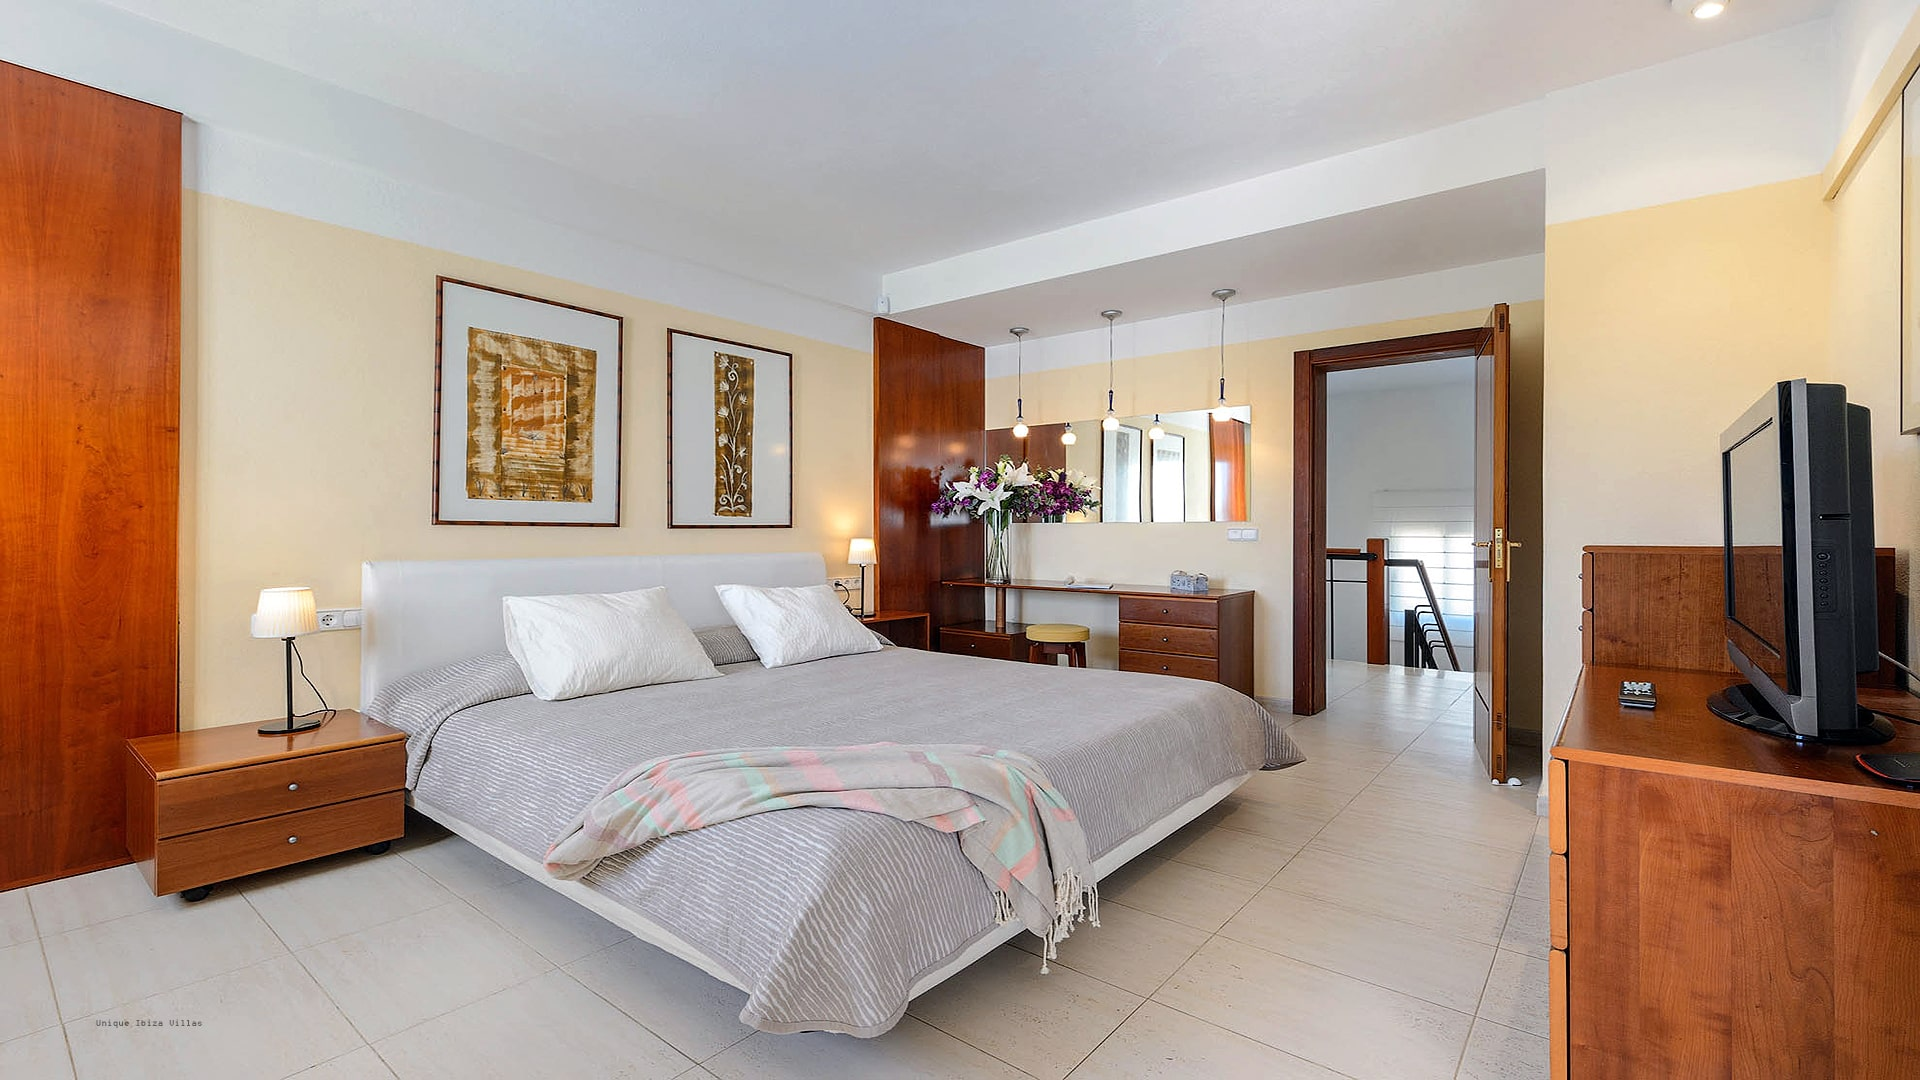 Villa Can Fluxa Ibiza 32 Bedroom 1